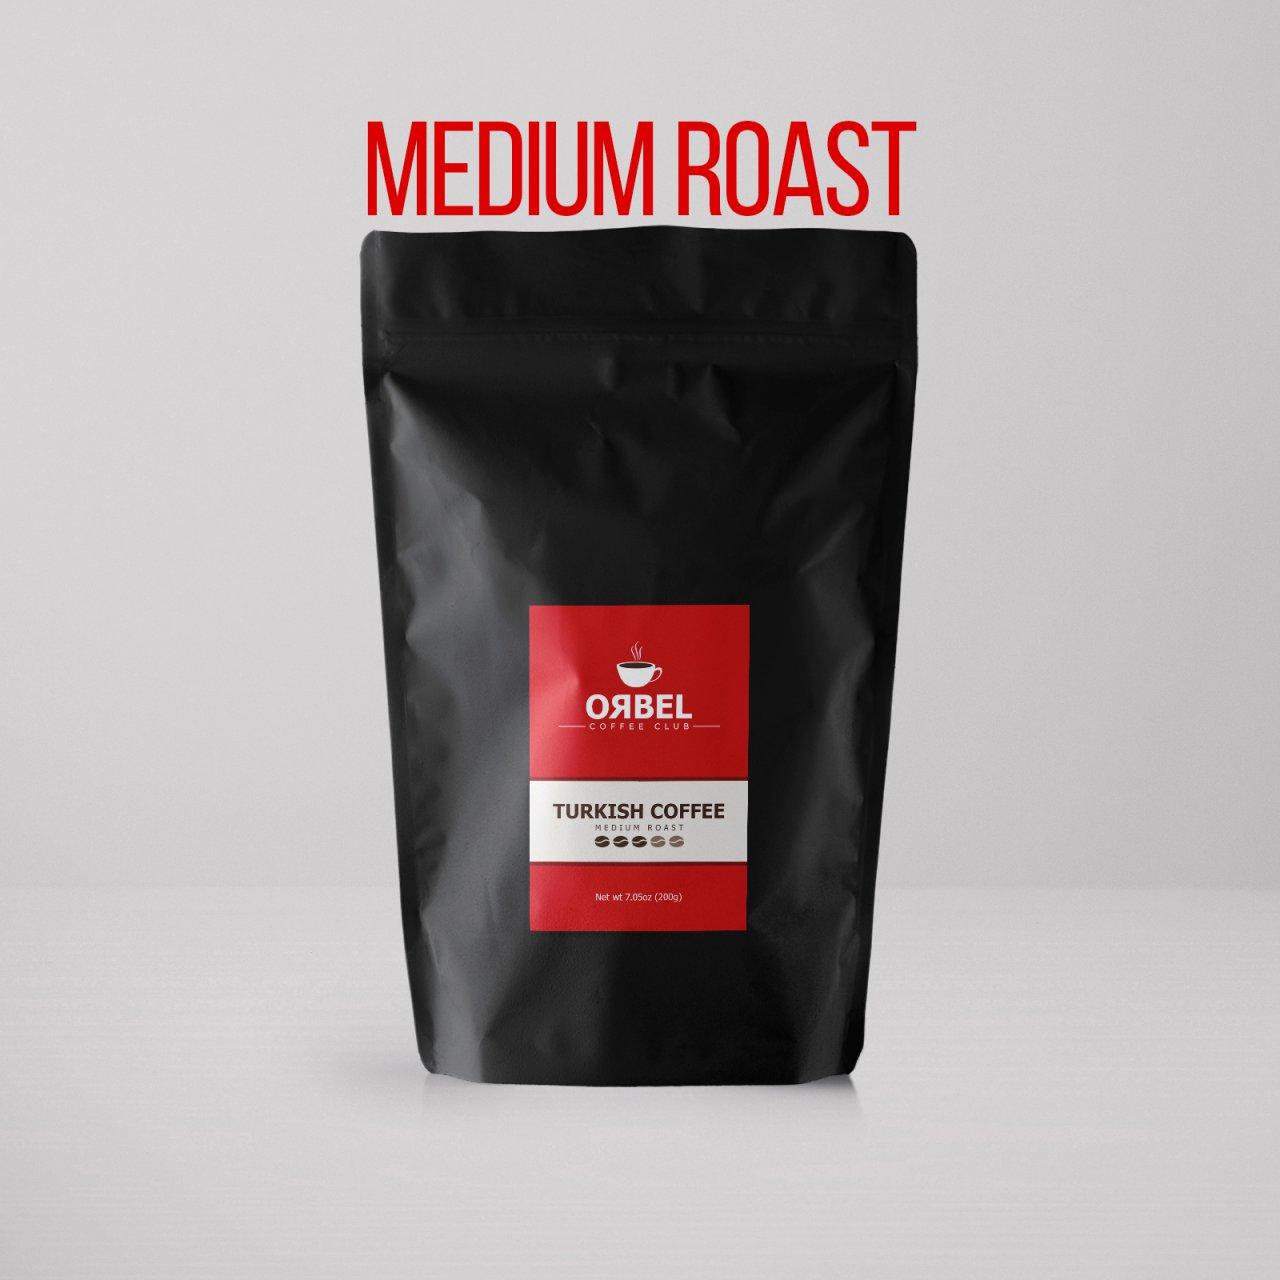 قهوه ترک مدیوم اربل ۱ کیلوگرمی